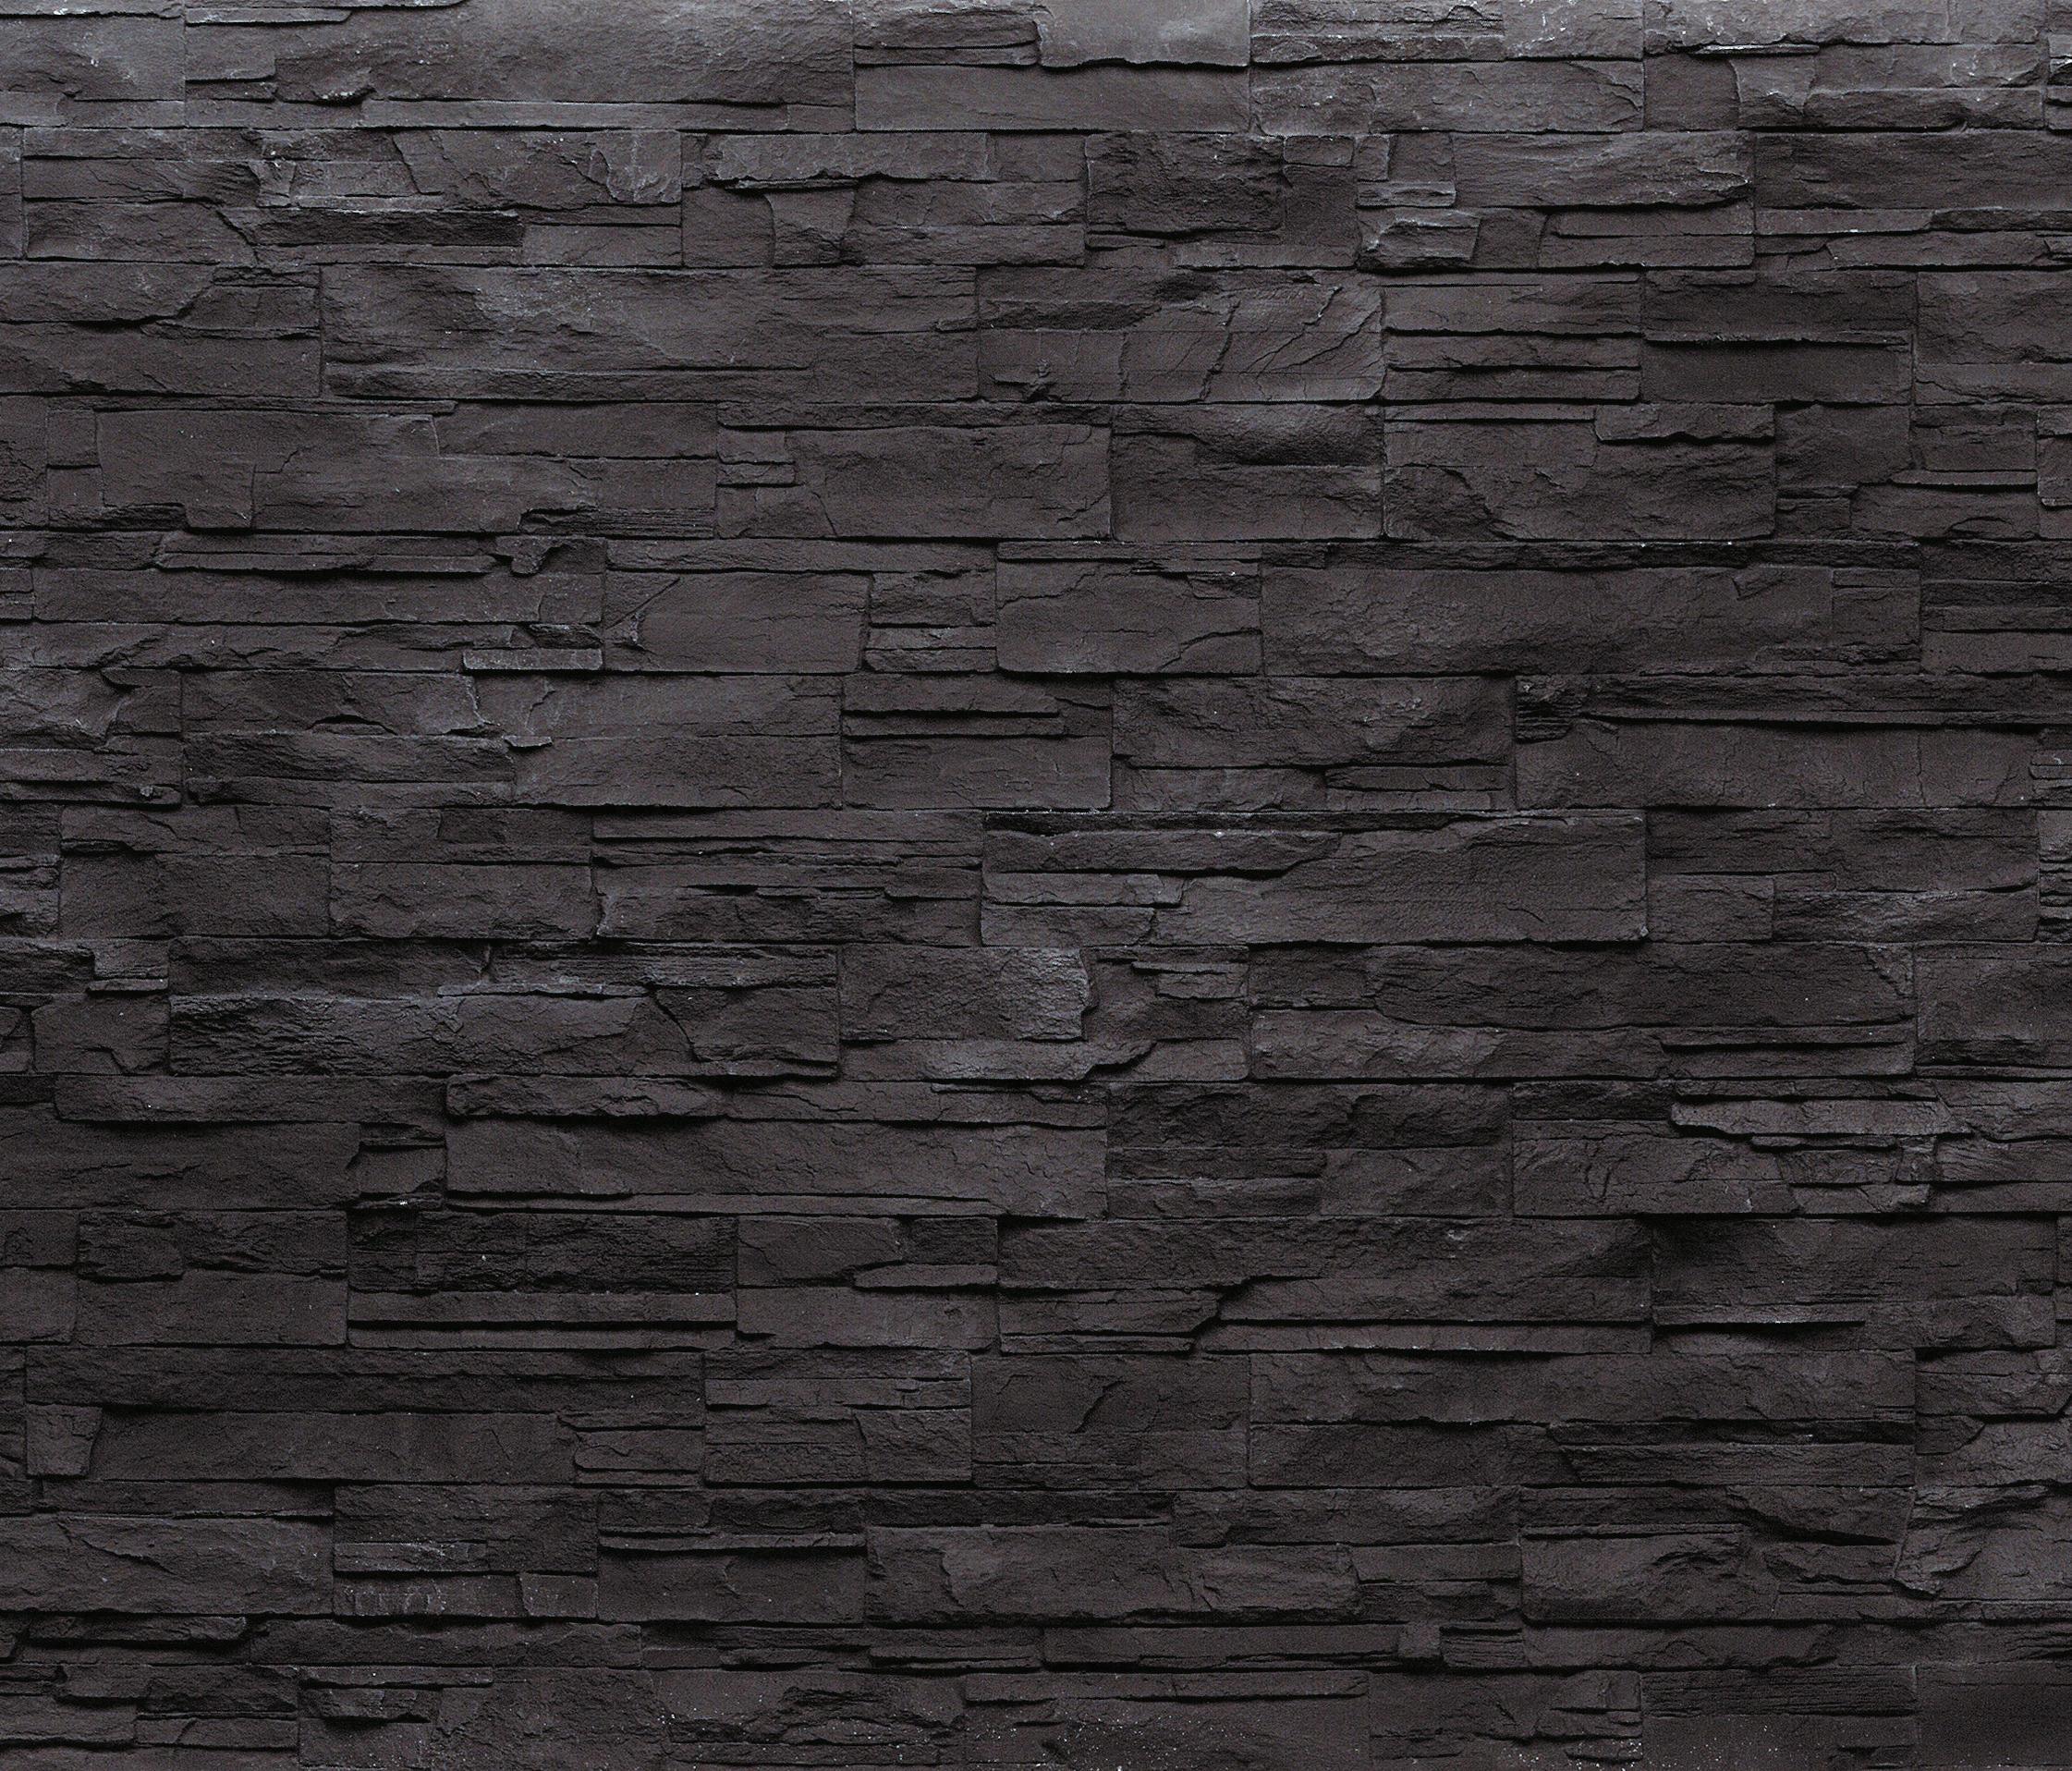 Msd lascas negra 270 composite panels from - Revestimiento piedra artificial ...